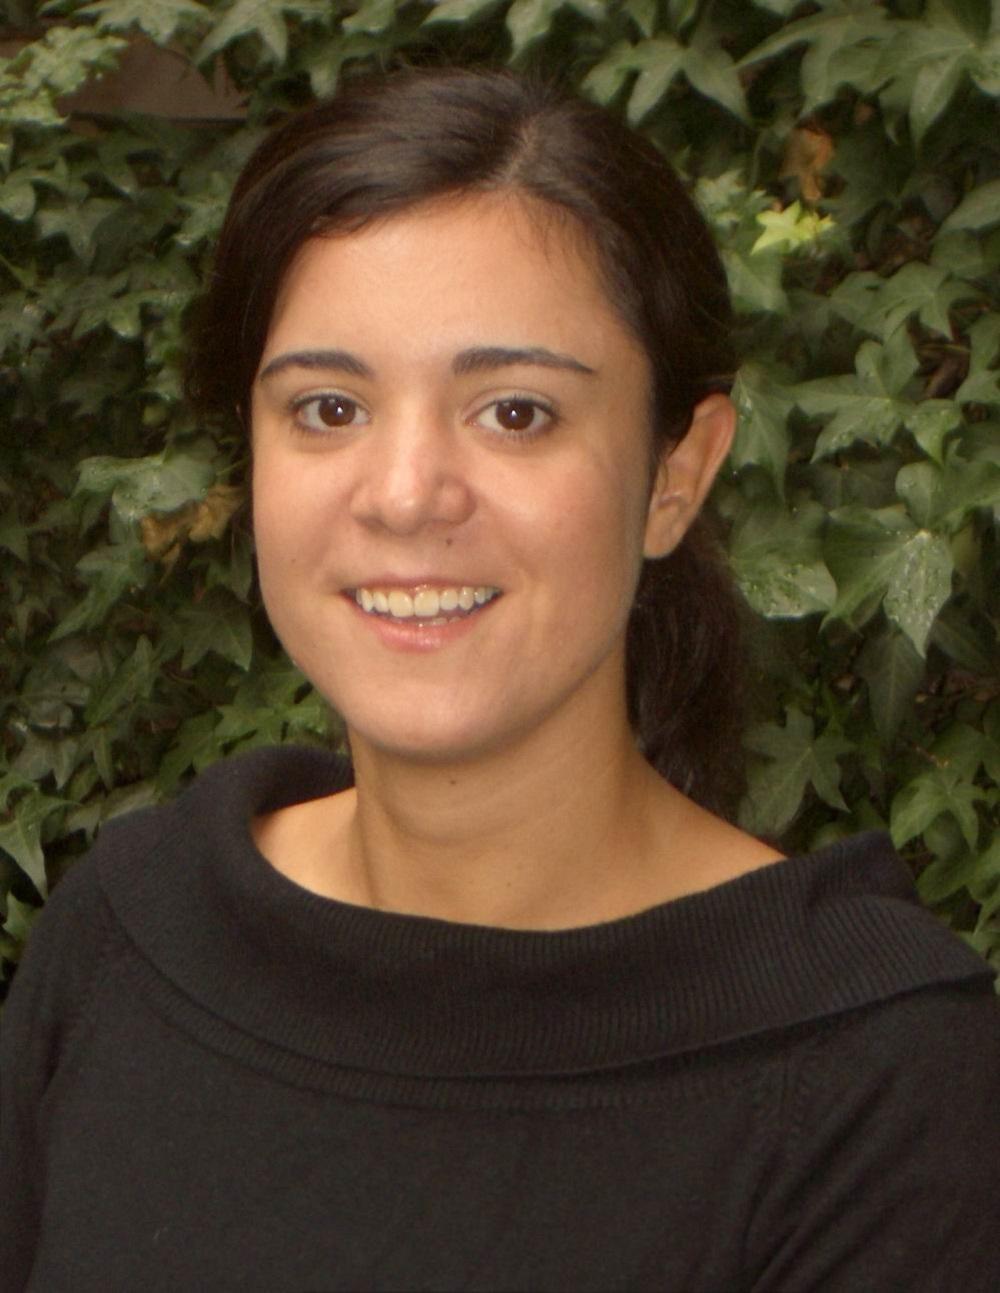 Veronika Hallwirth